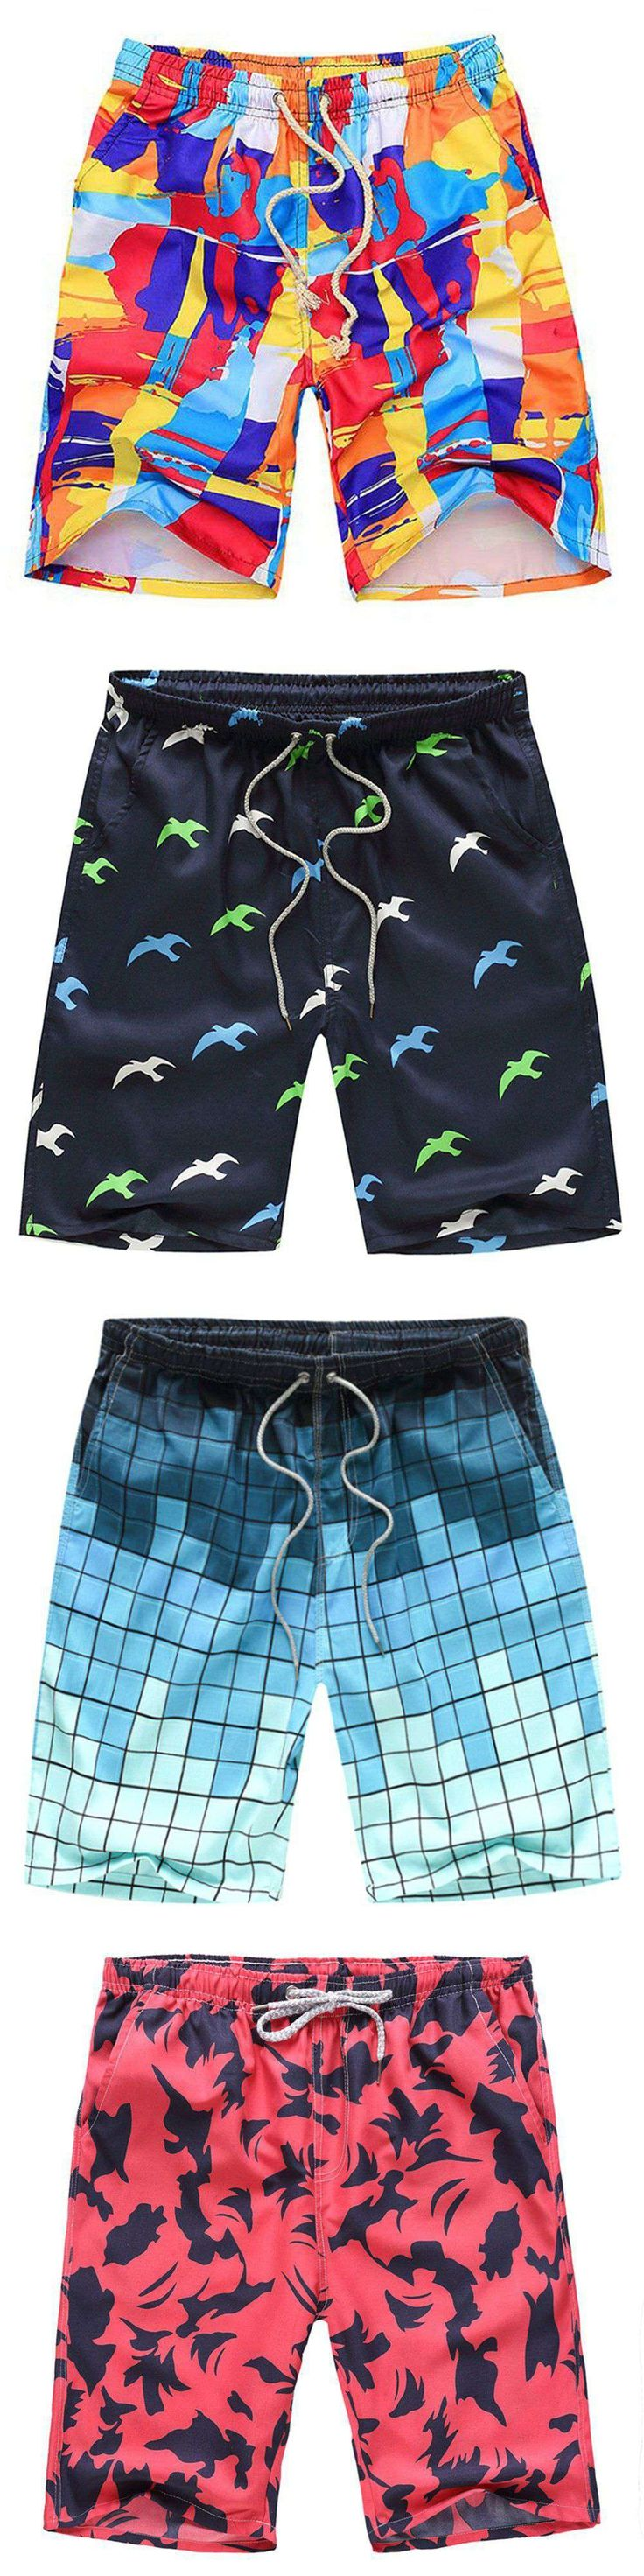 Mens Brand Boardshorts Men Board Short Quick Dry Bermuda Casual Loose Beach Shorts Plus Size Hot